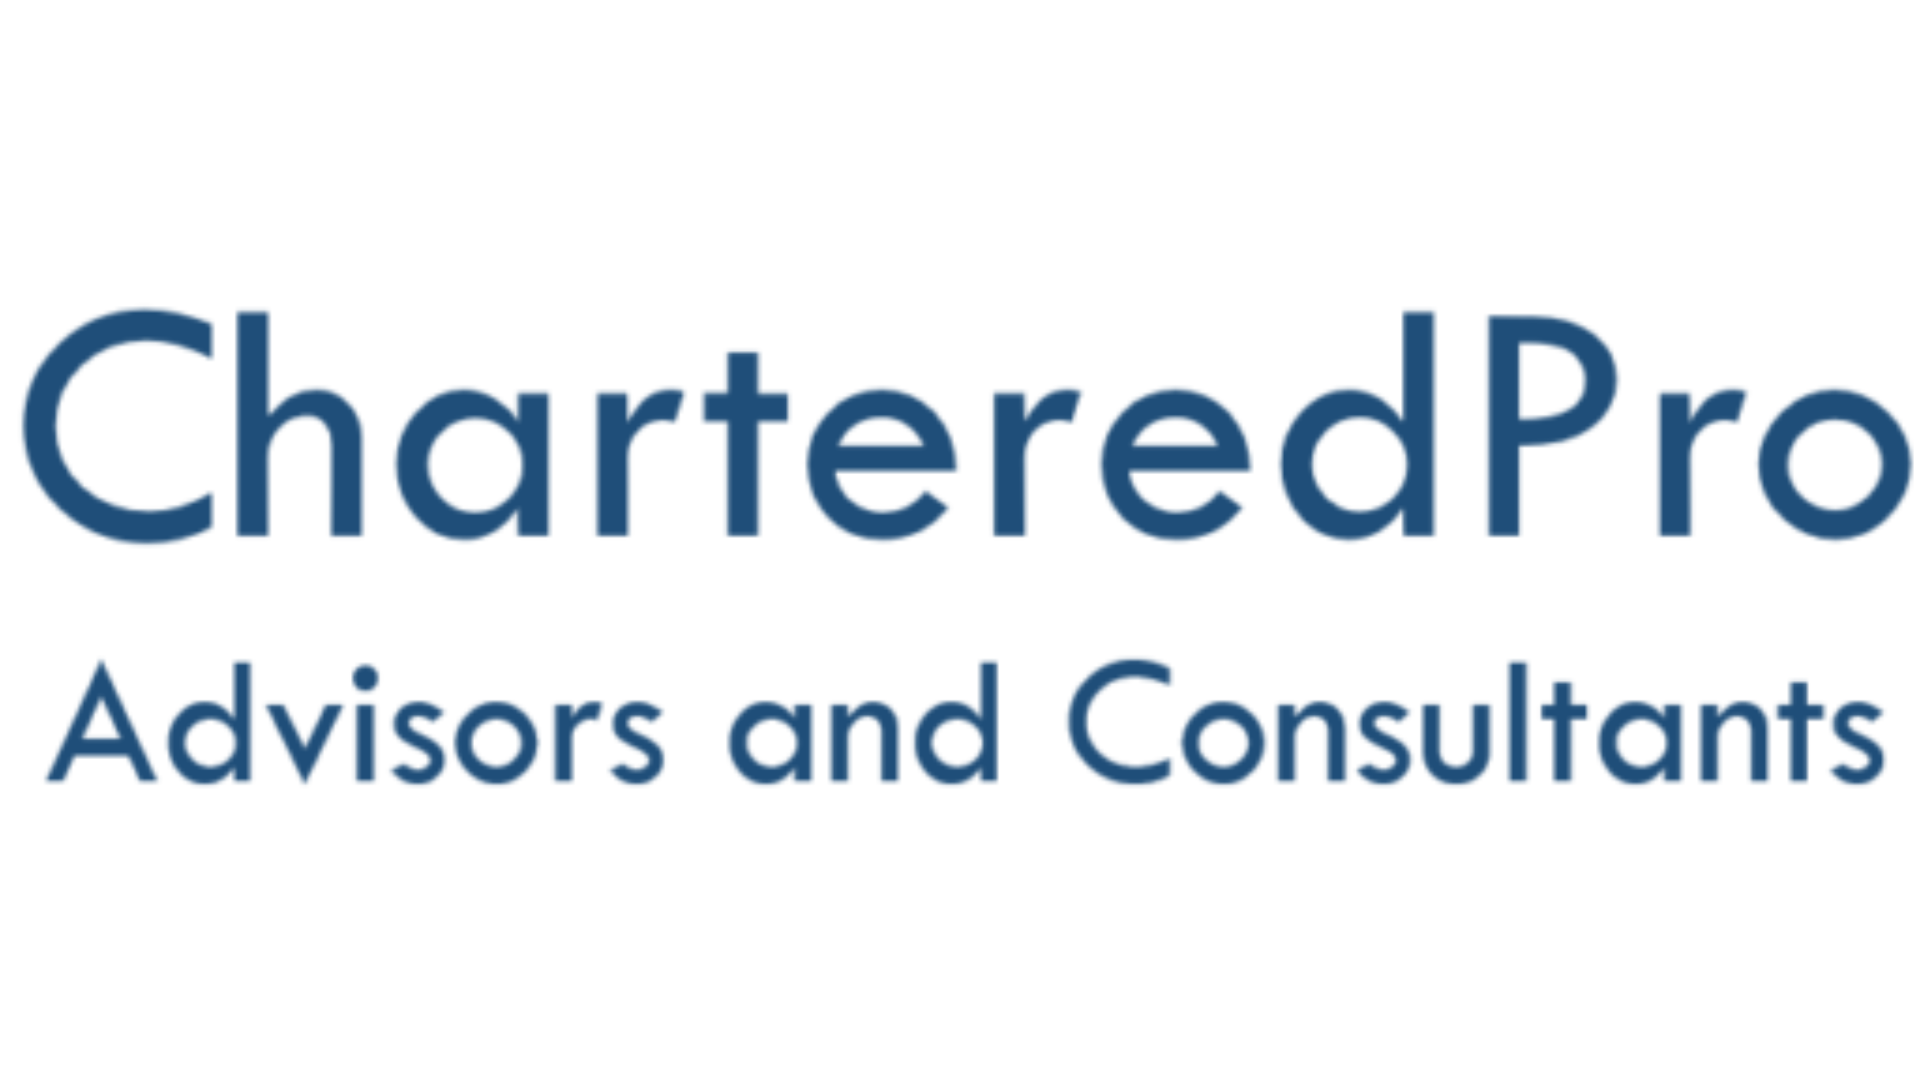 CharteredPro